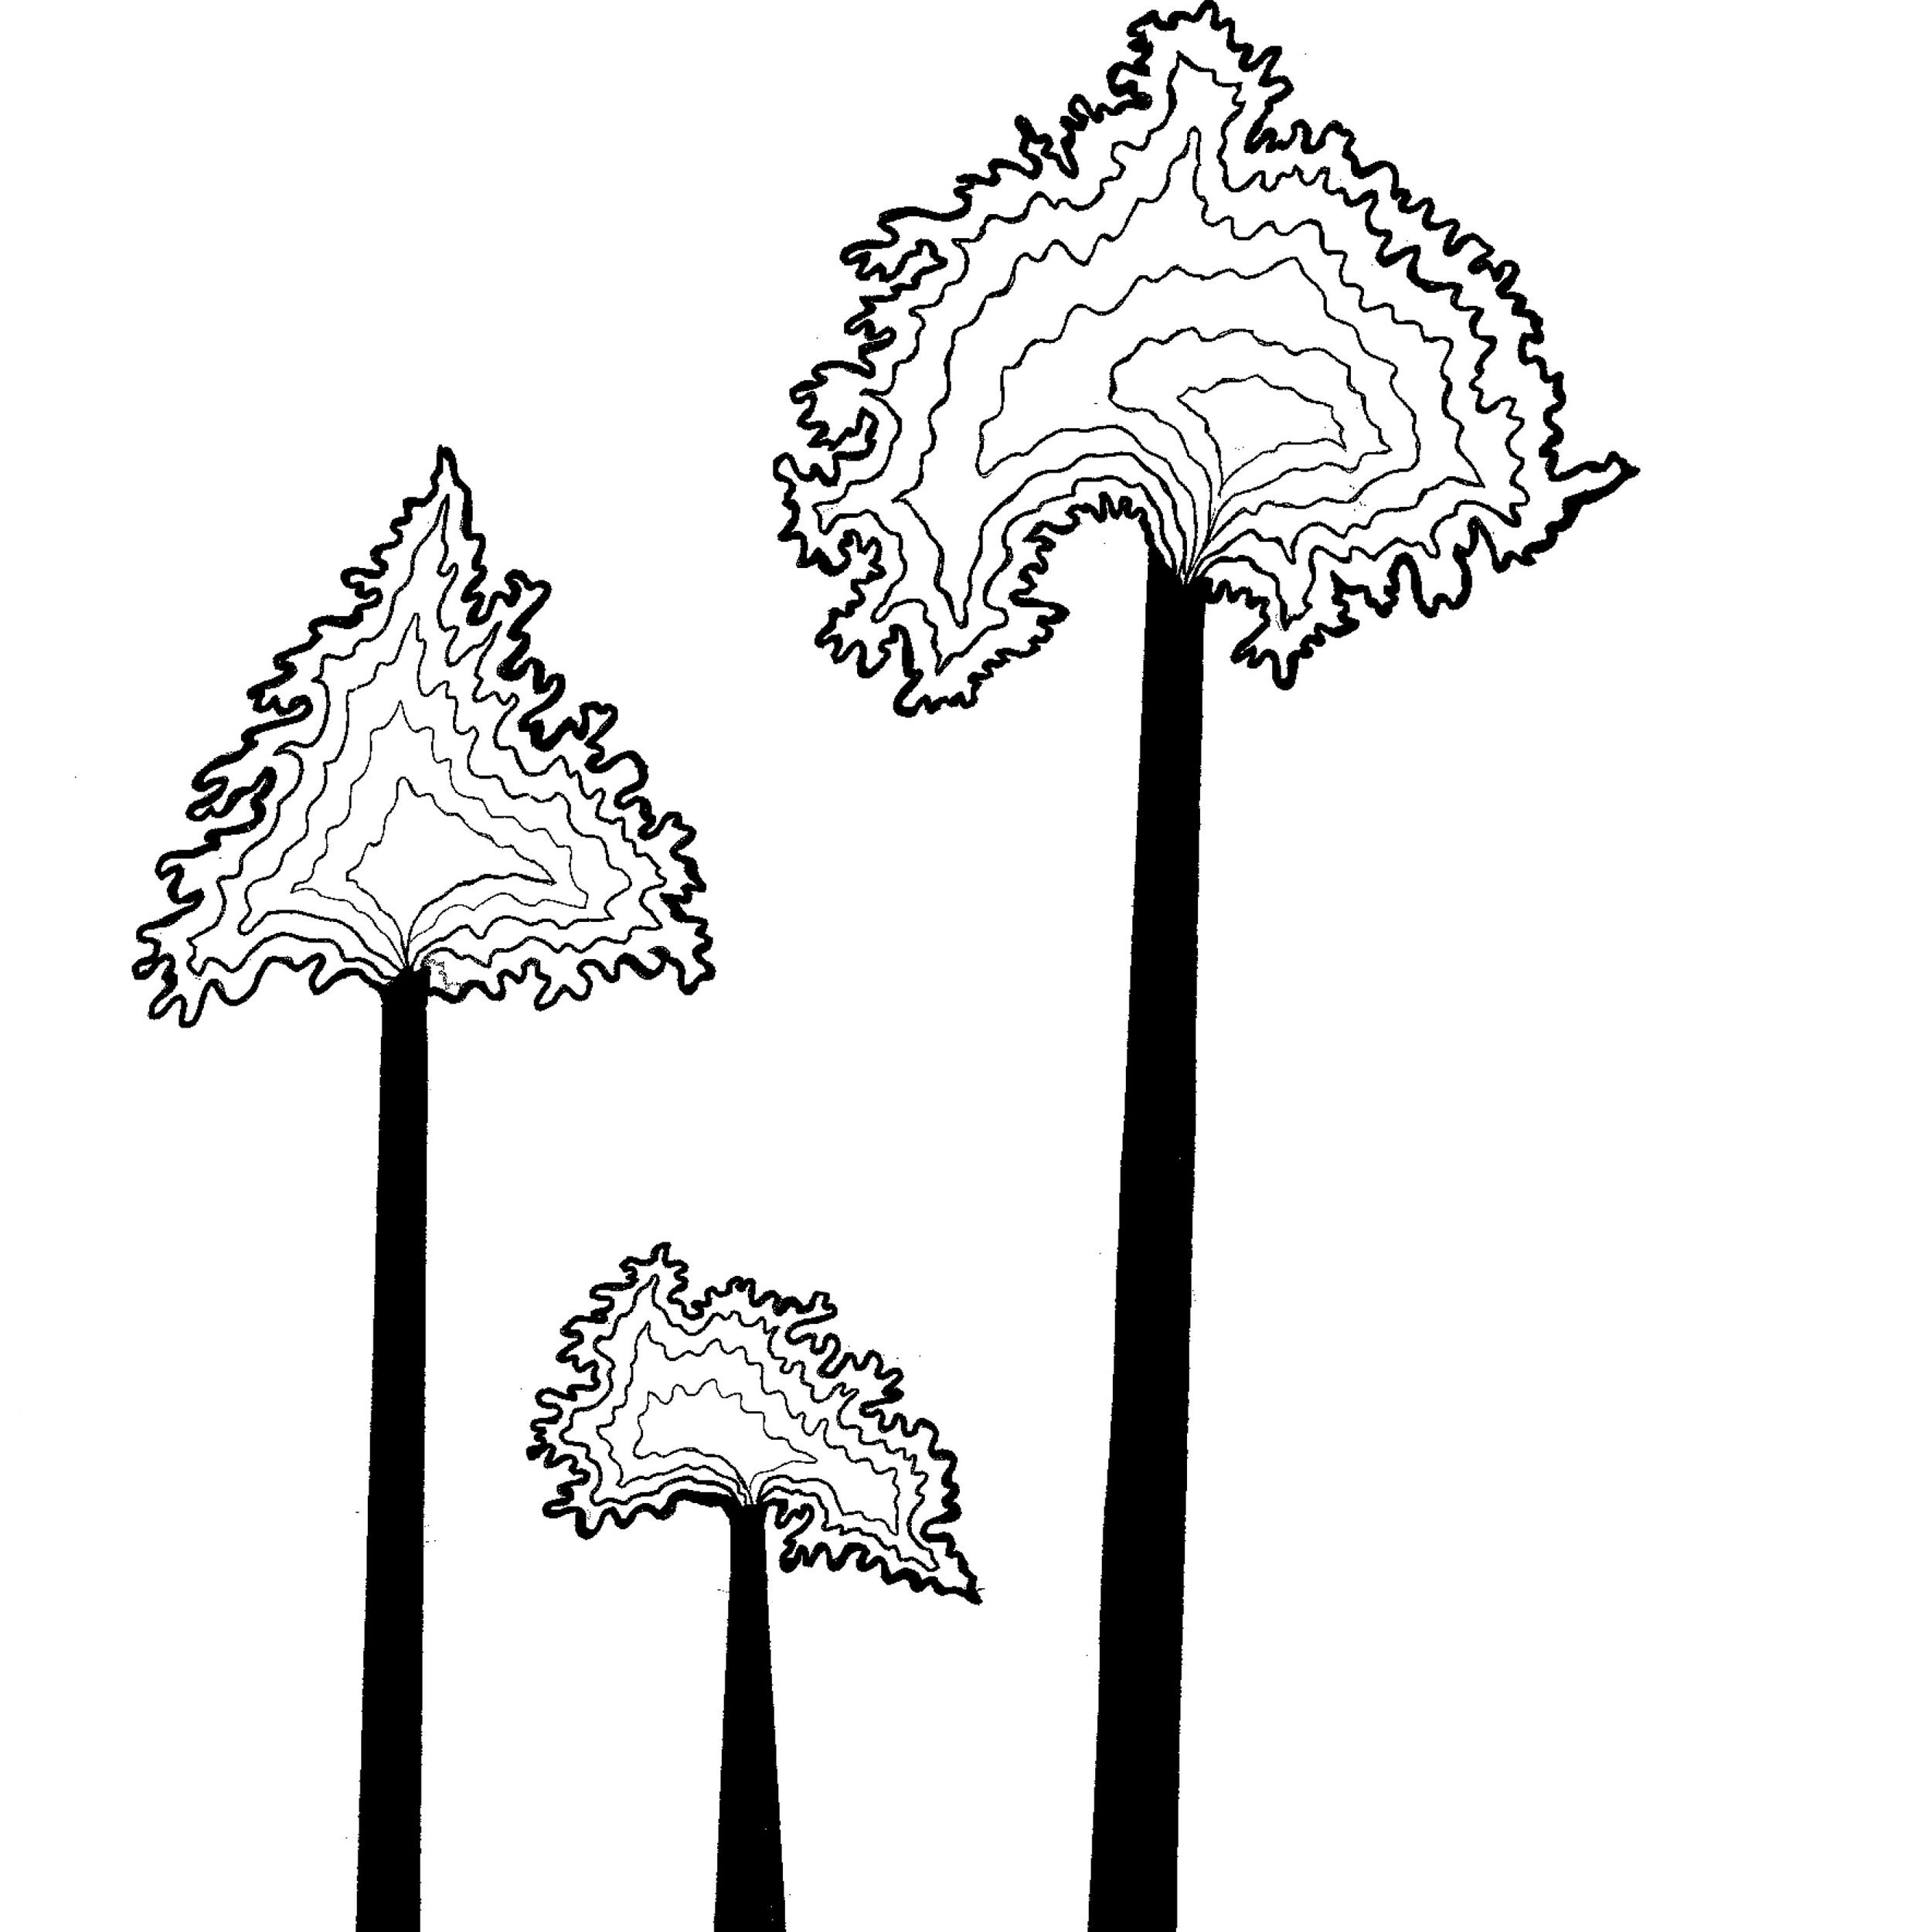 Trees 2014 11.jpg